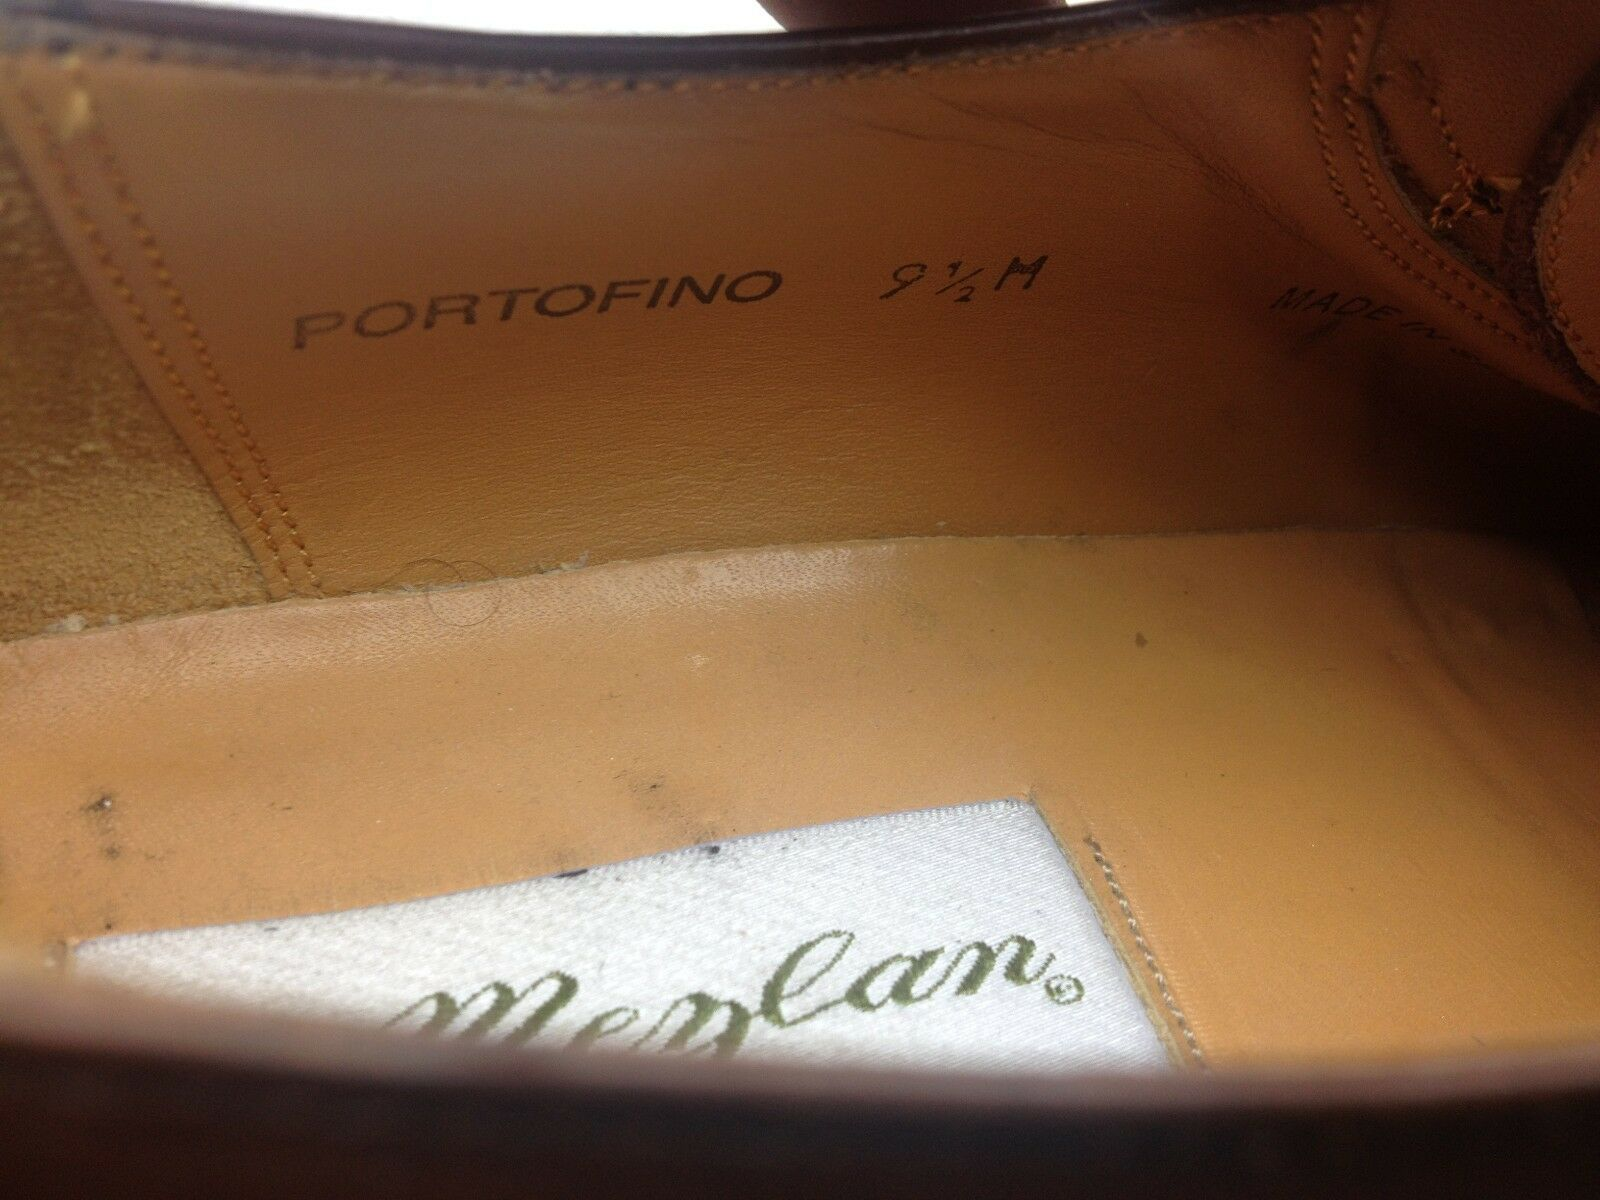 MADE IN SPAIN MEZLAN PORTOFINO PORTOFINO PORTOFINO BROWN LEATHER BUCKLE DRESS SHOES 9.5 D 2c48d0